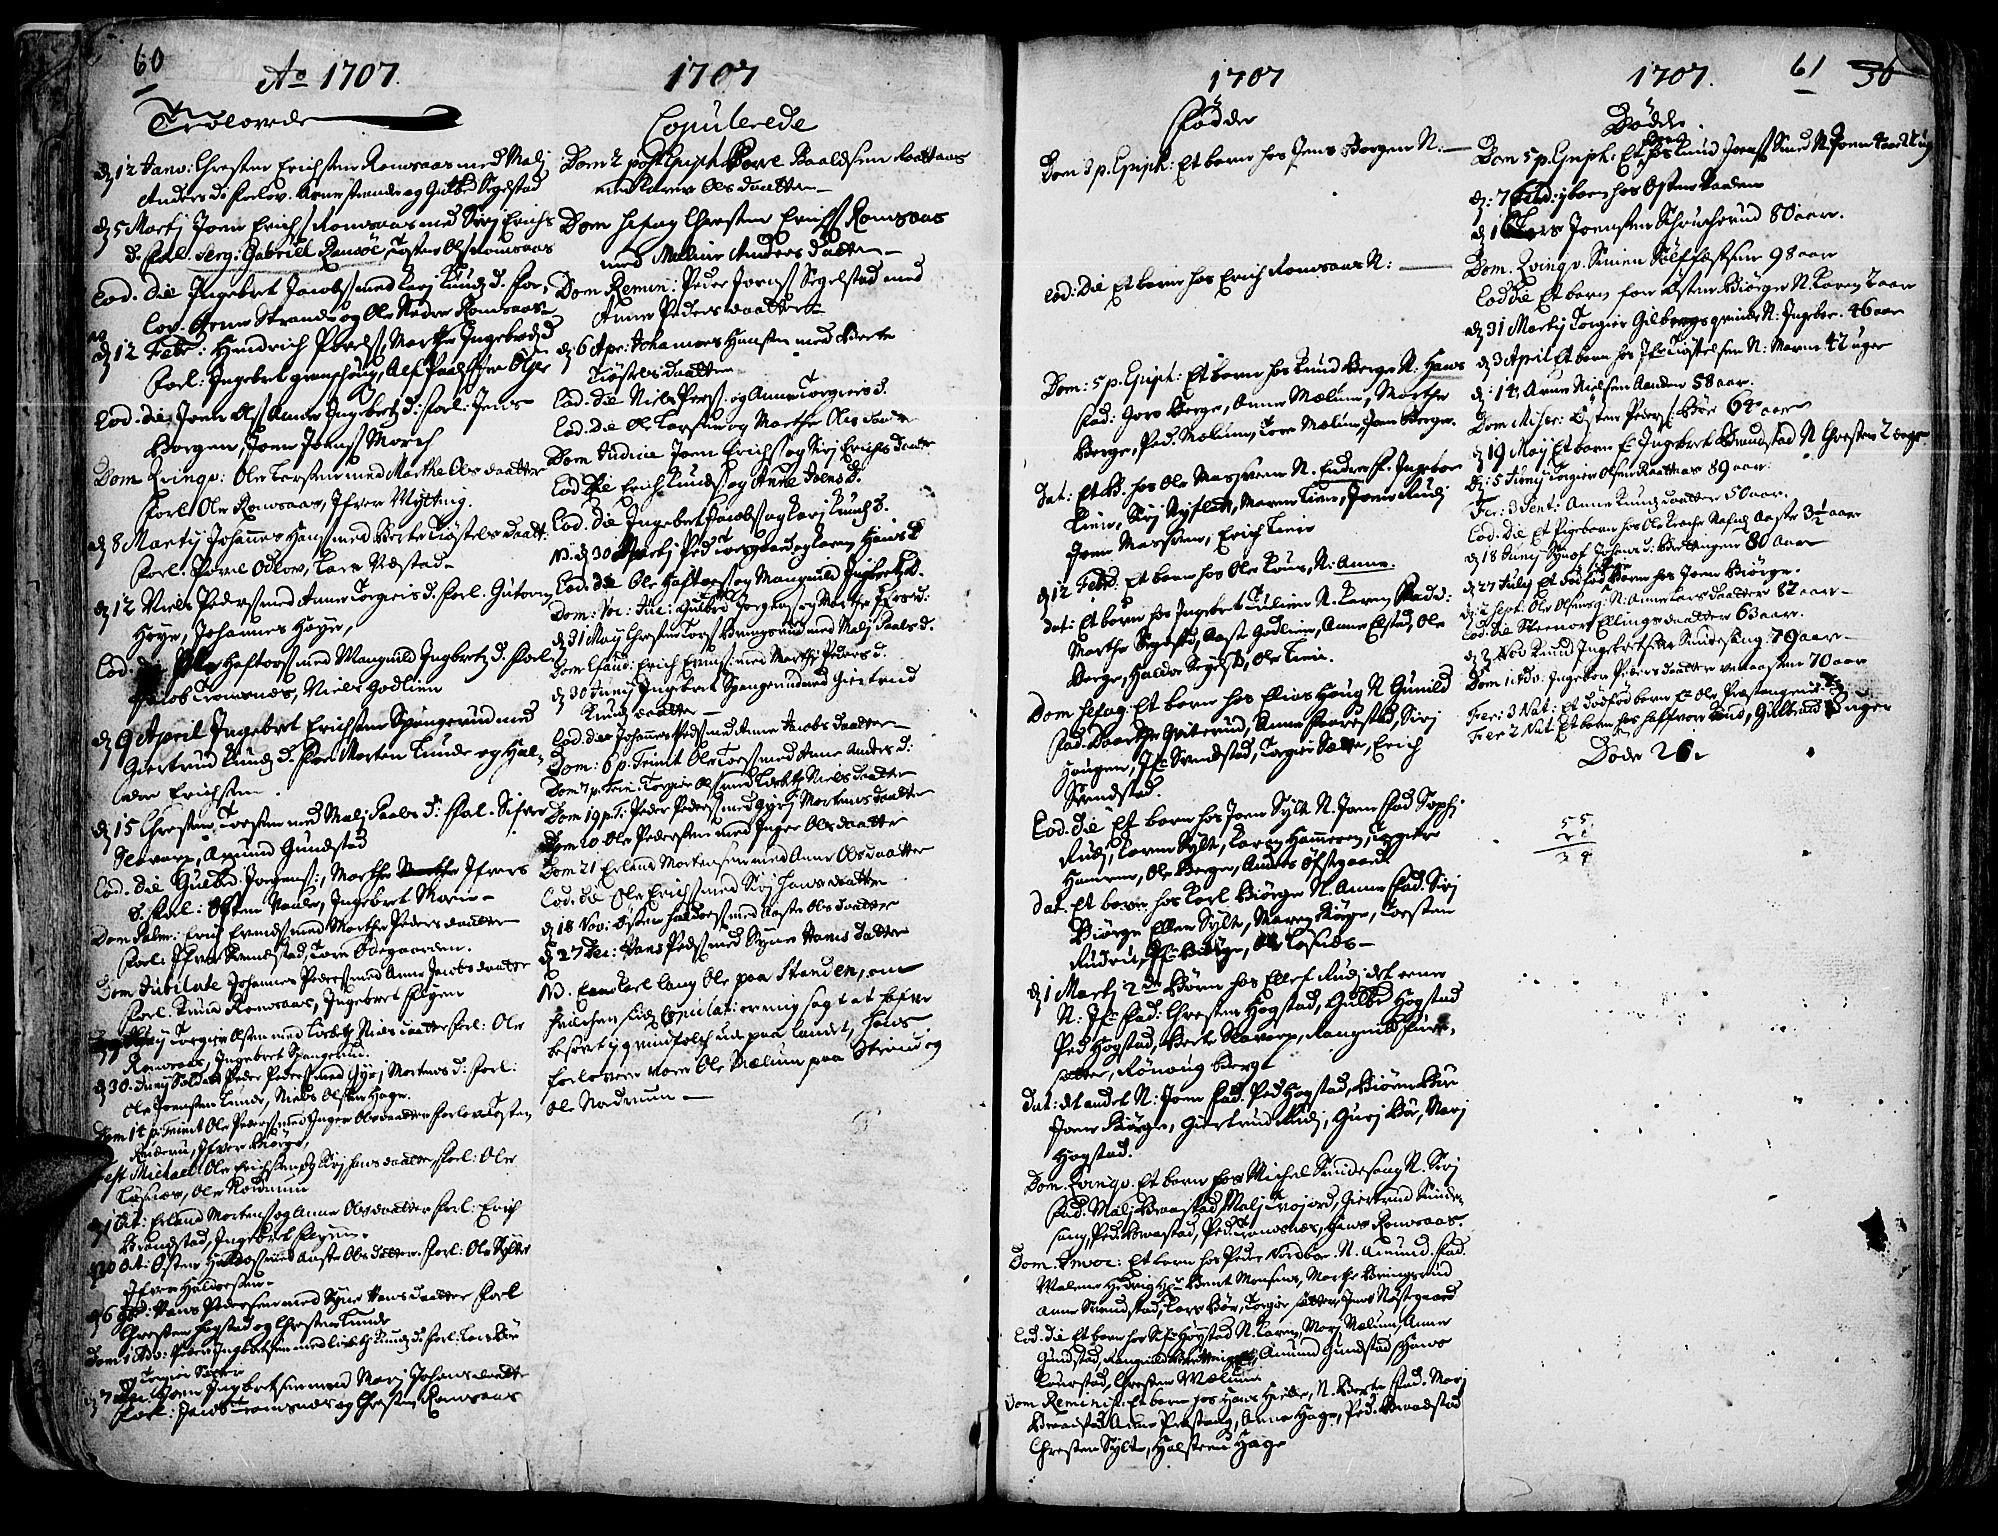 SAH, Ringebu prestekontor, Ministerialbok nr. 1, 1696-1733, s. 60-61